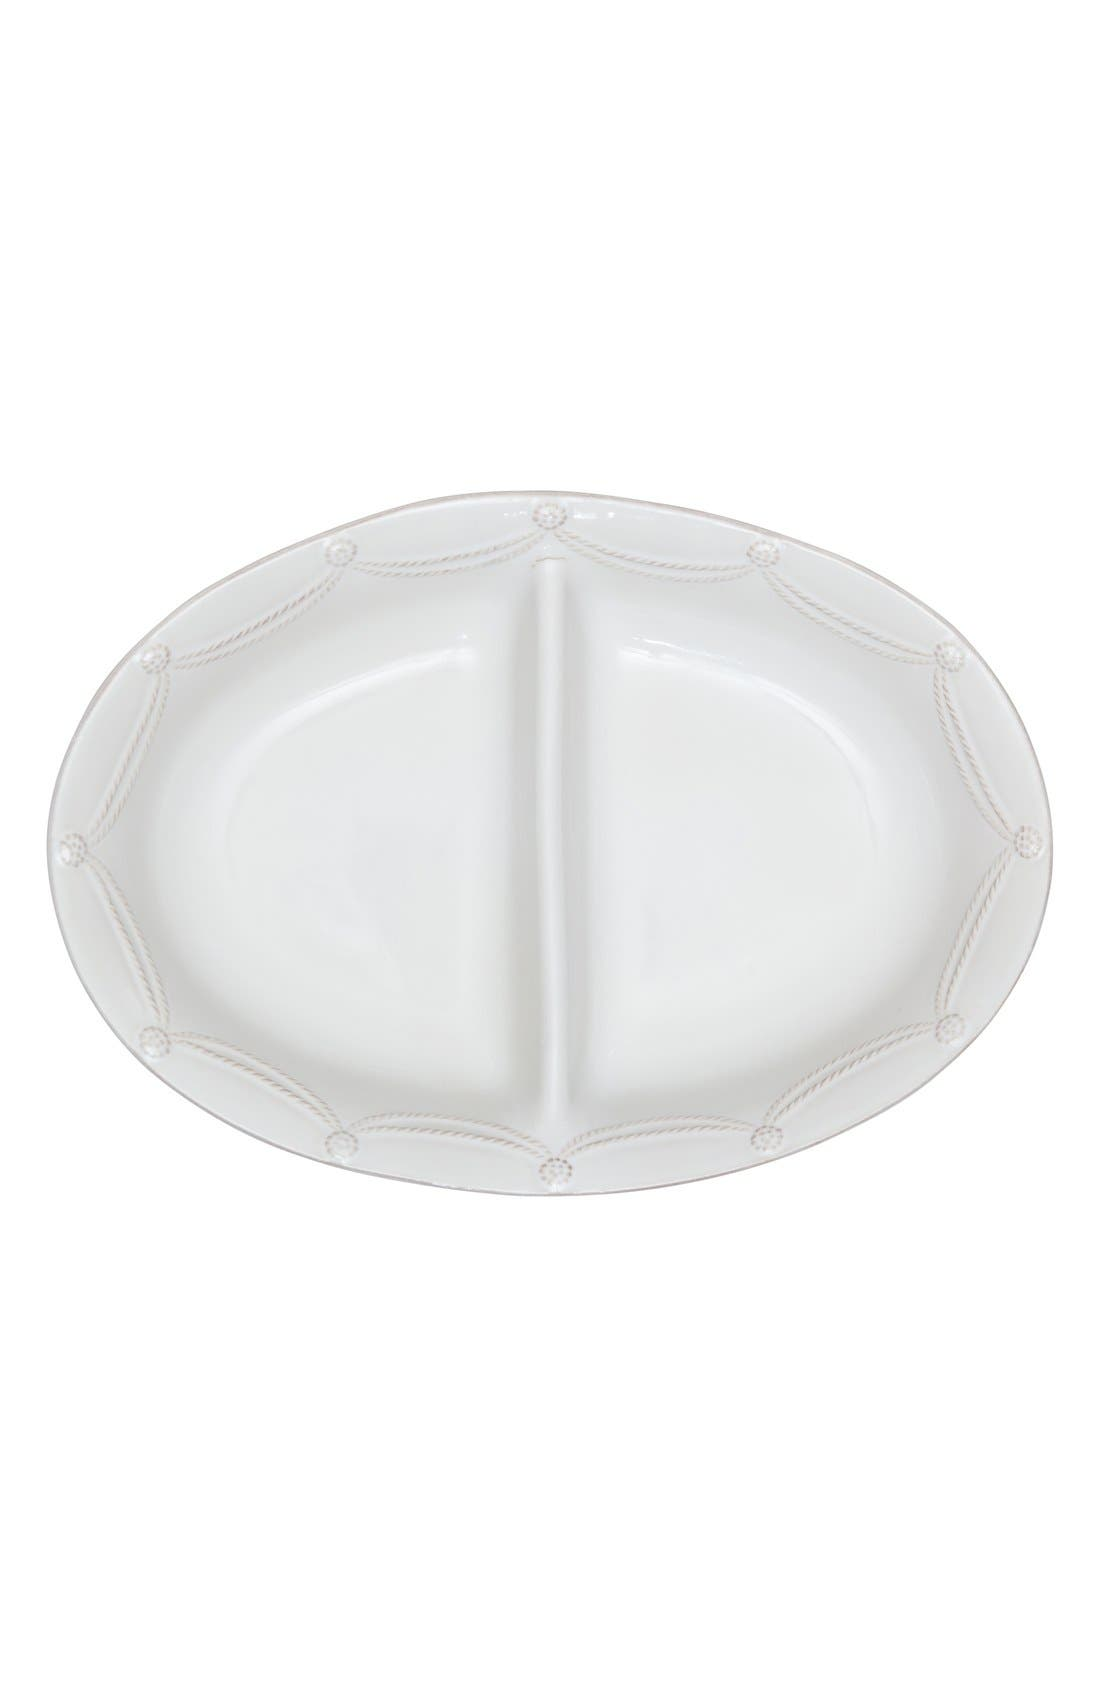 Alternate Image 2  - Juliska'Berry and Thread' Ceramic Divided Bowl